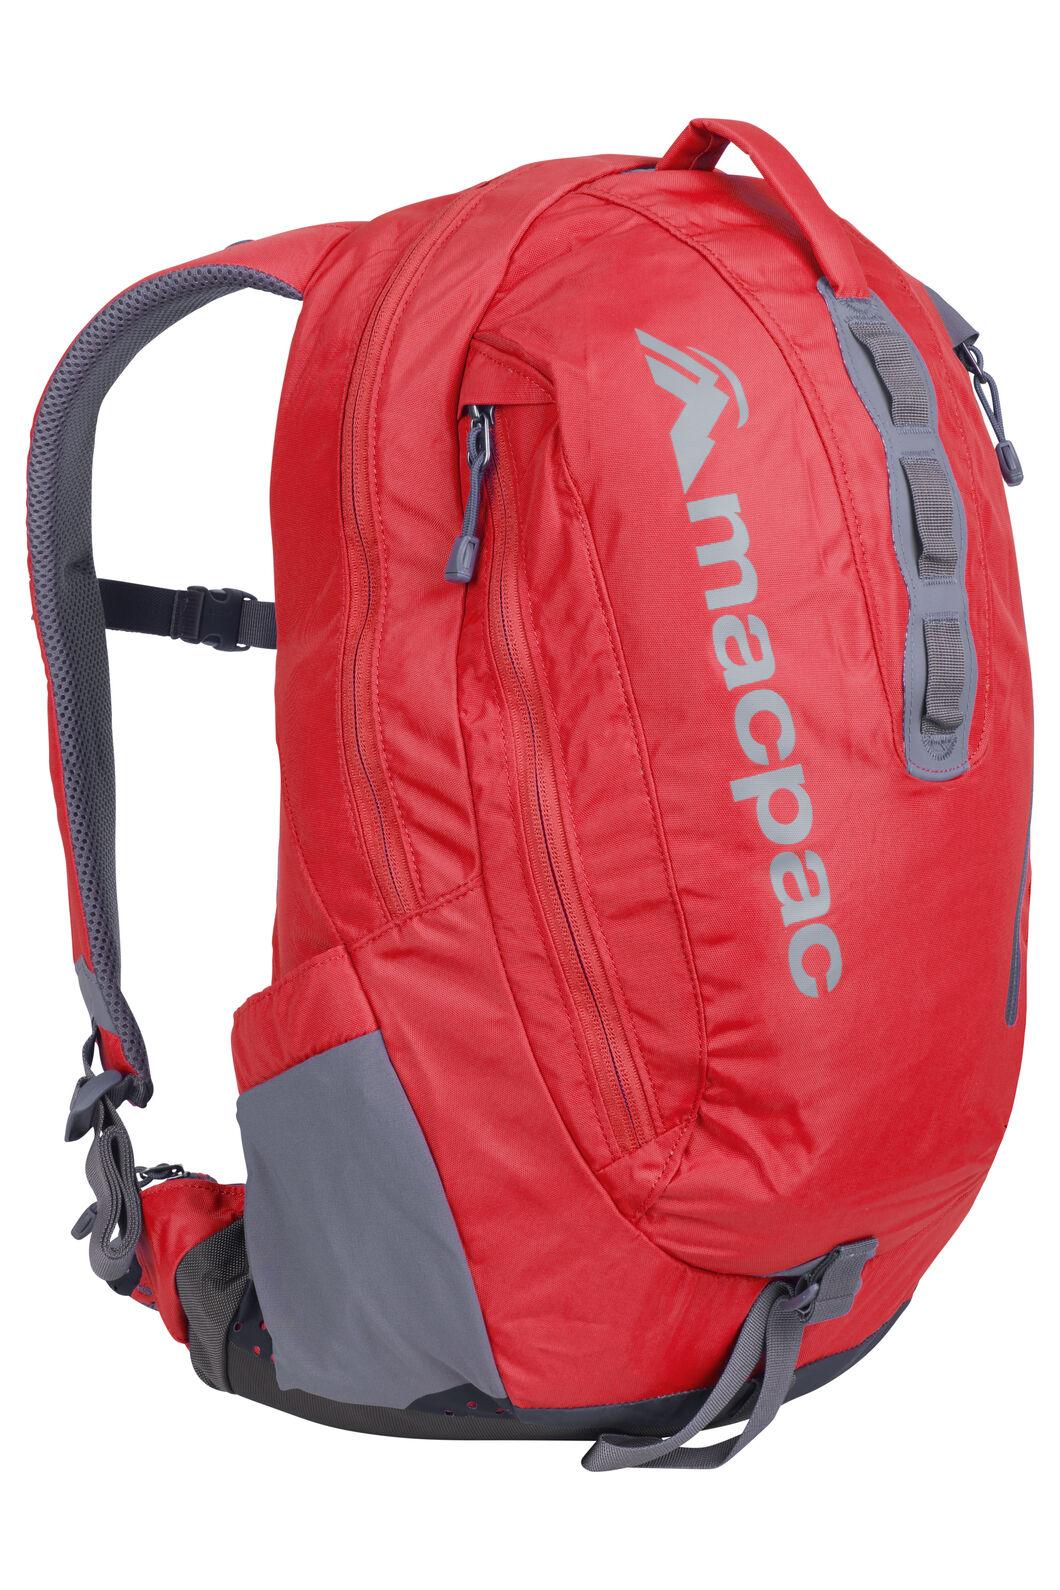 Macpac Rapaki 26L Daypack, Molten Lava, hi-res